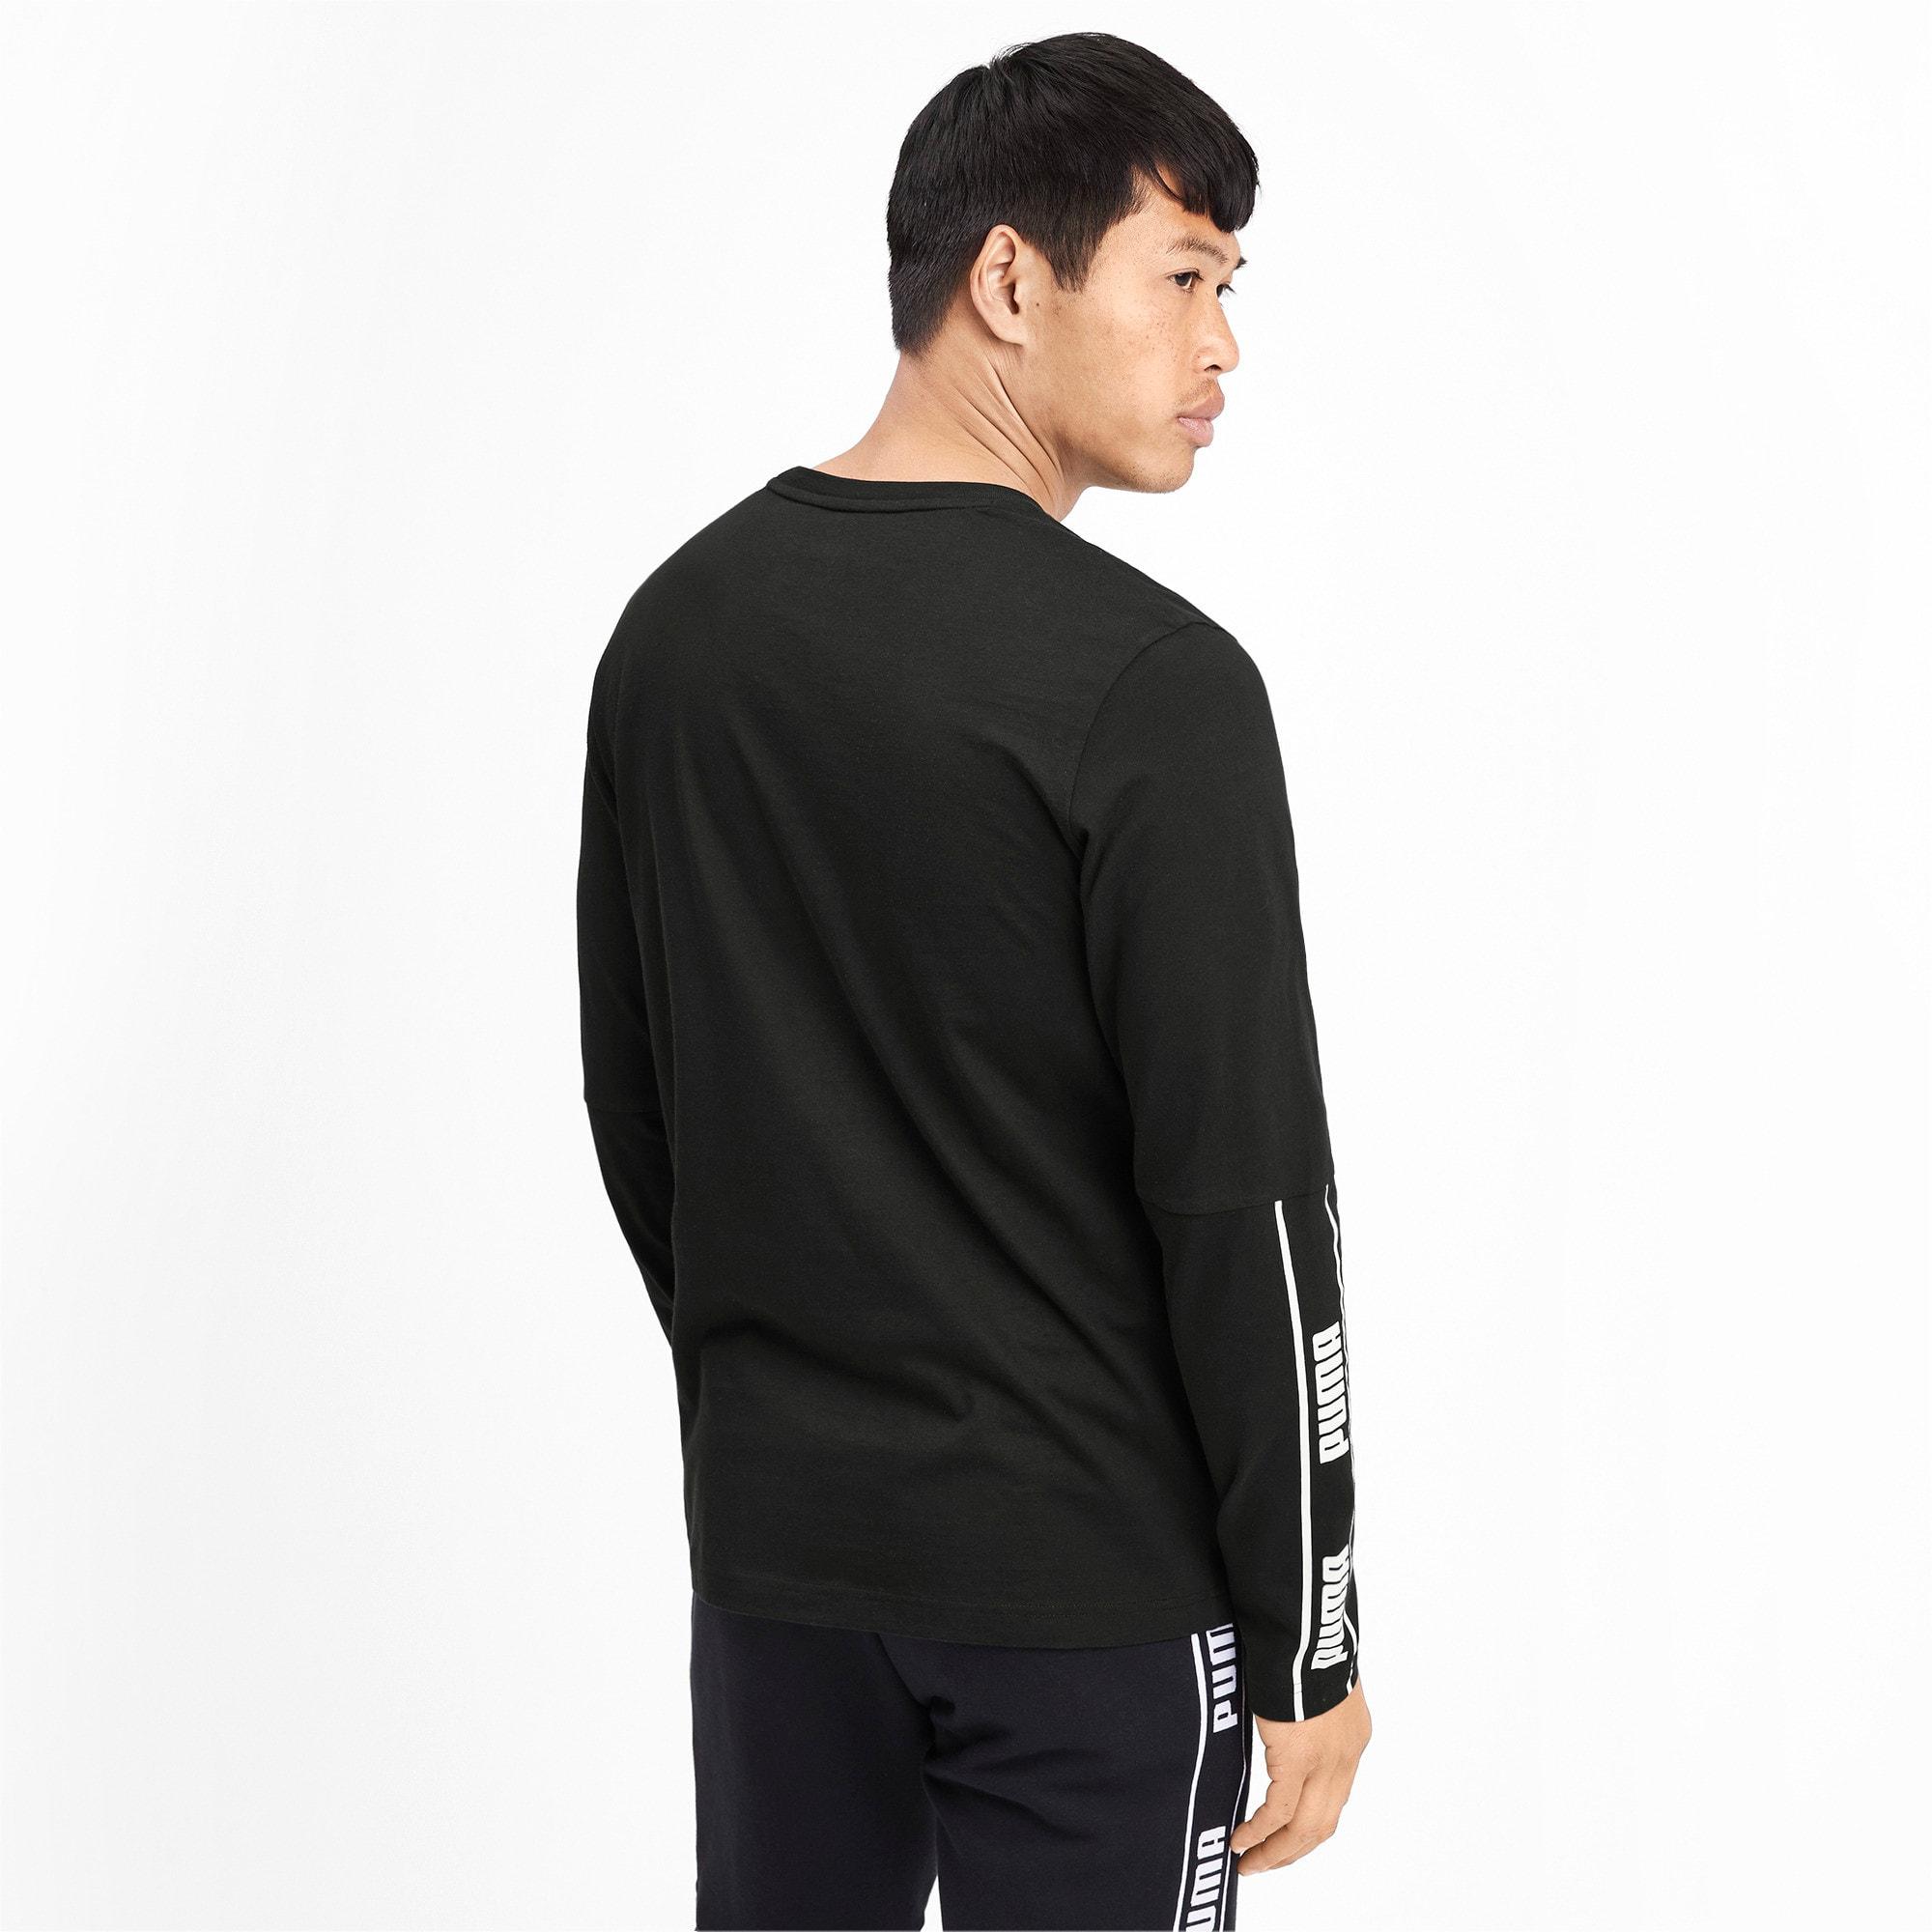 Miniatura 3 de Camiseta de mangas largas Amplified para hombre, Puma Black, mediano